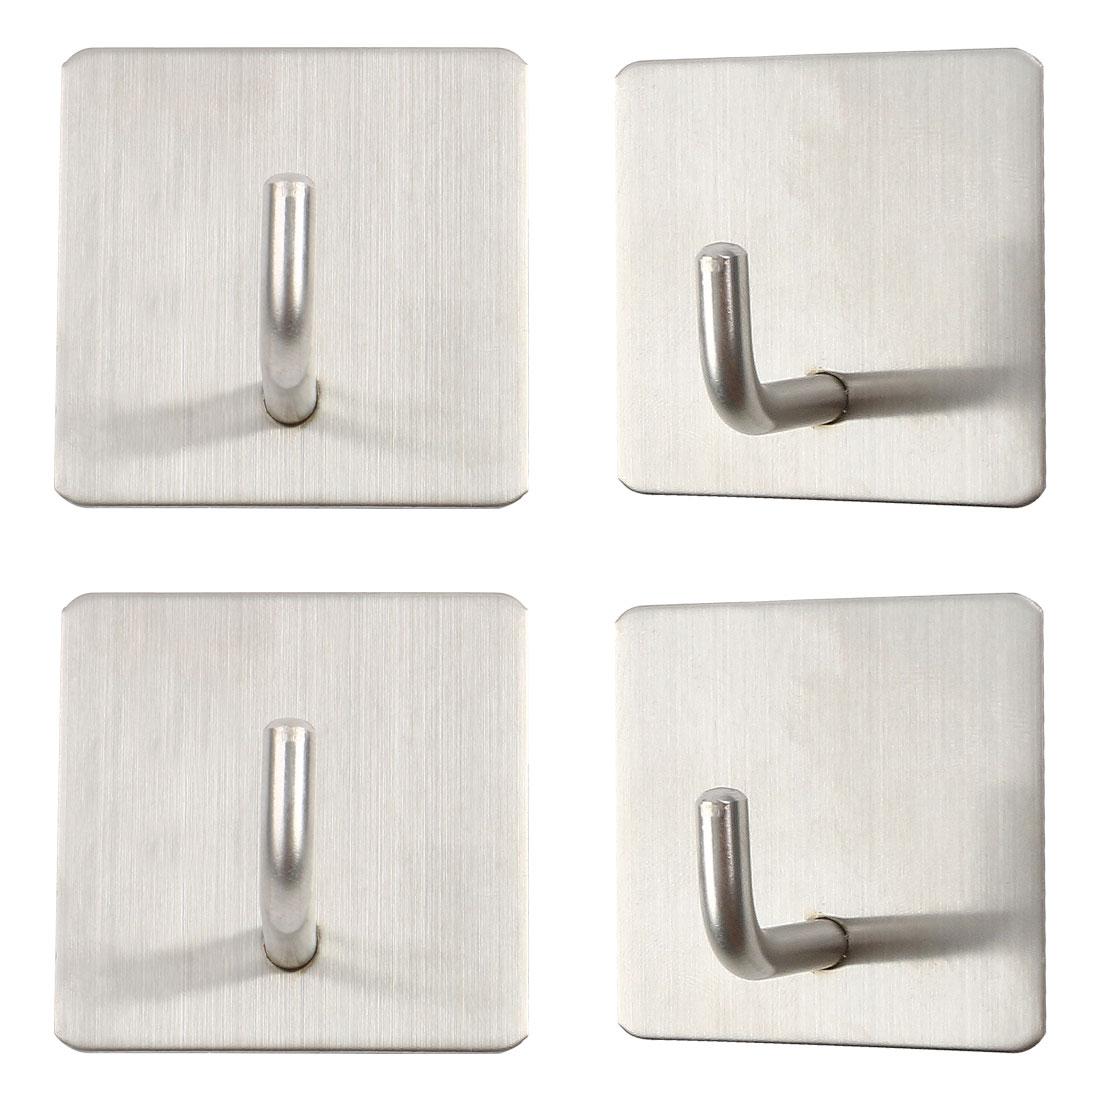 4pcs Stainless Steel Self Stick Wall Bathroom Hook Coat Towel Hanger Storage